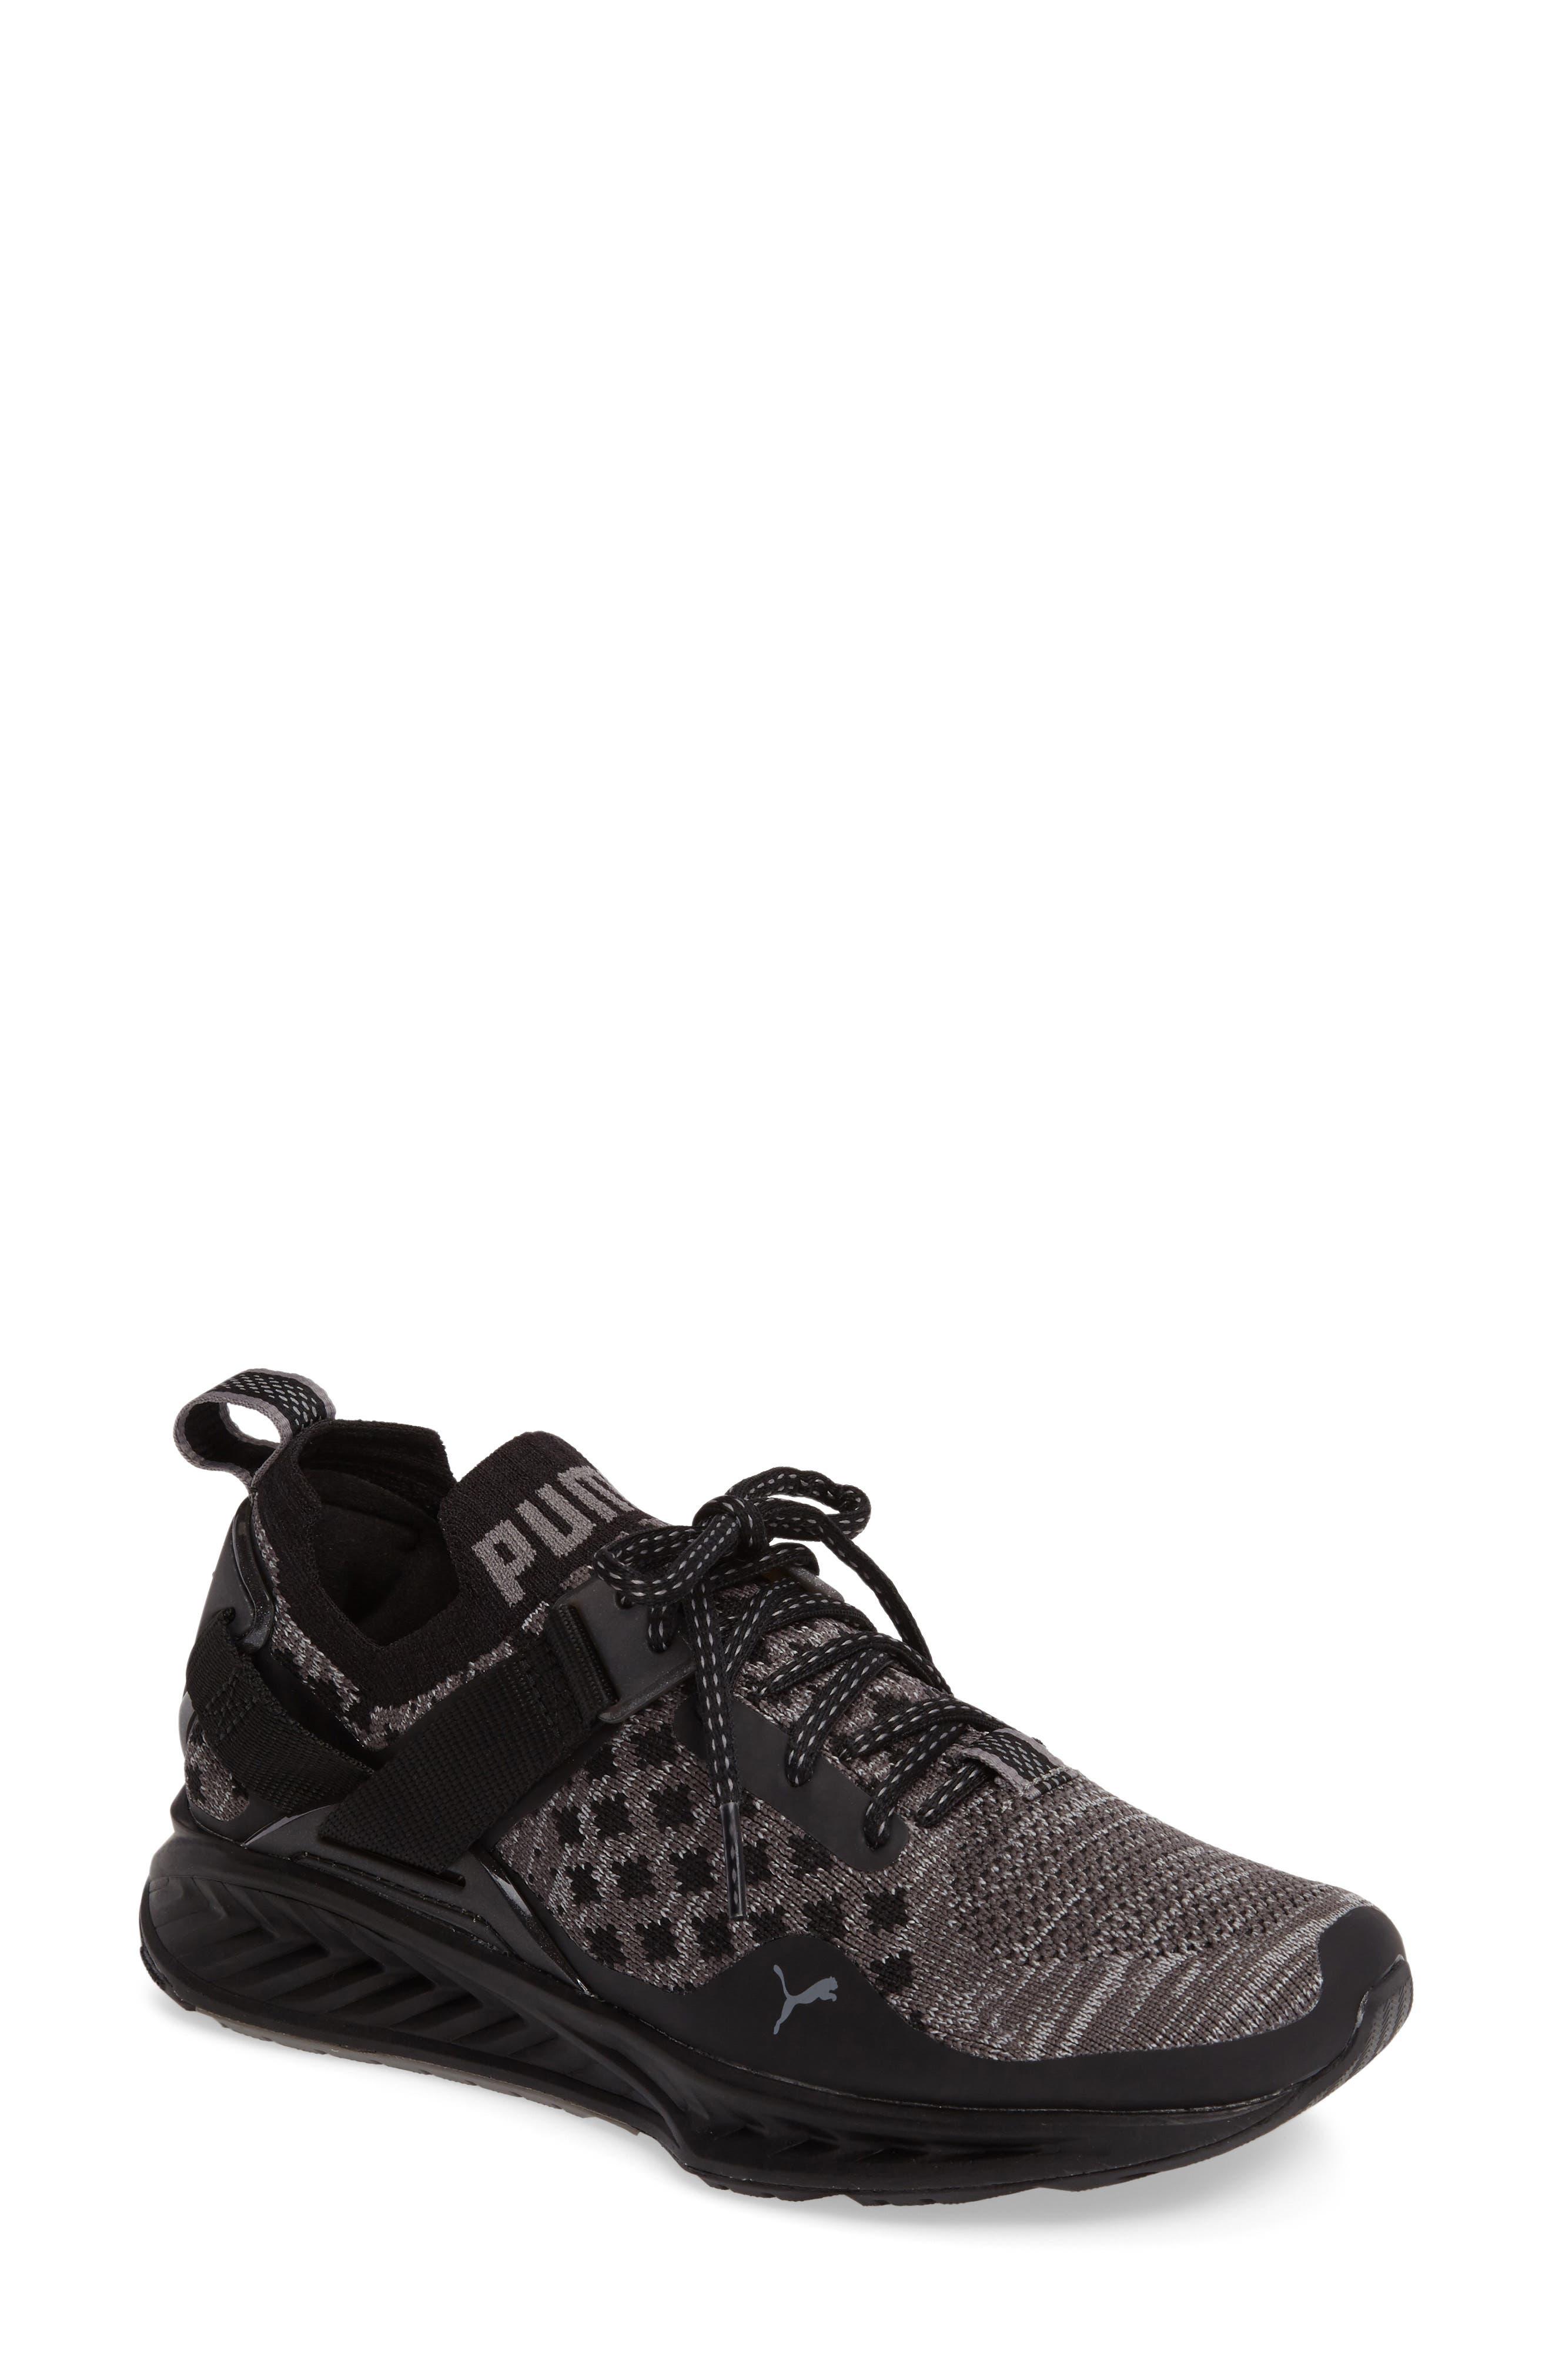 Main Image - PUMA IGNITE evoKNIT Low Sneaker (Women)